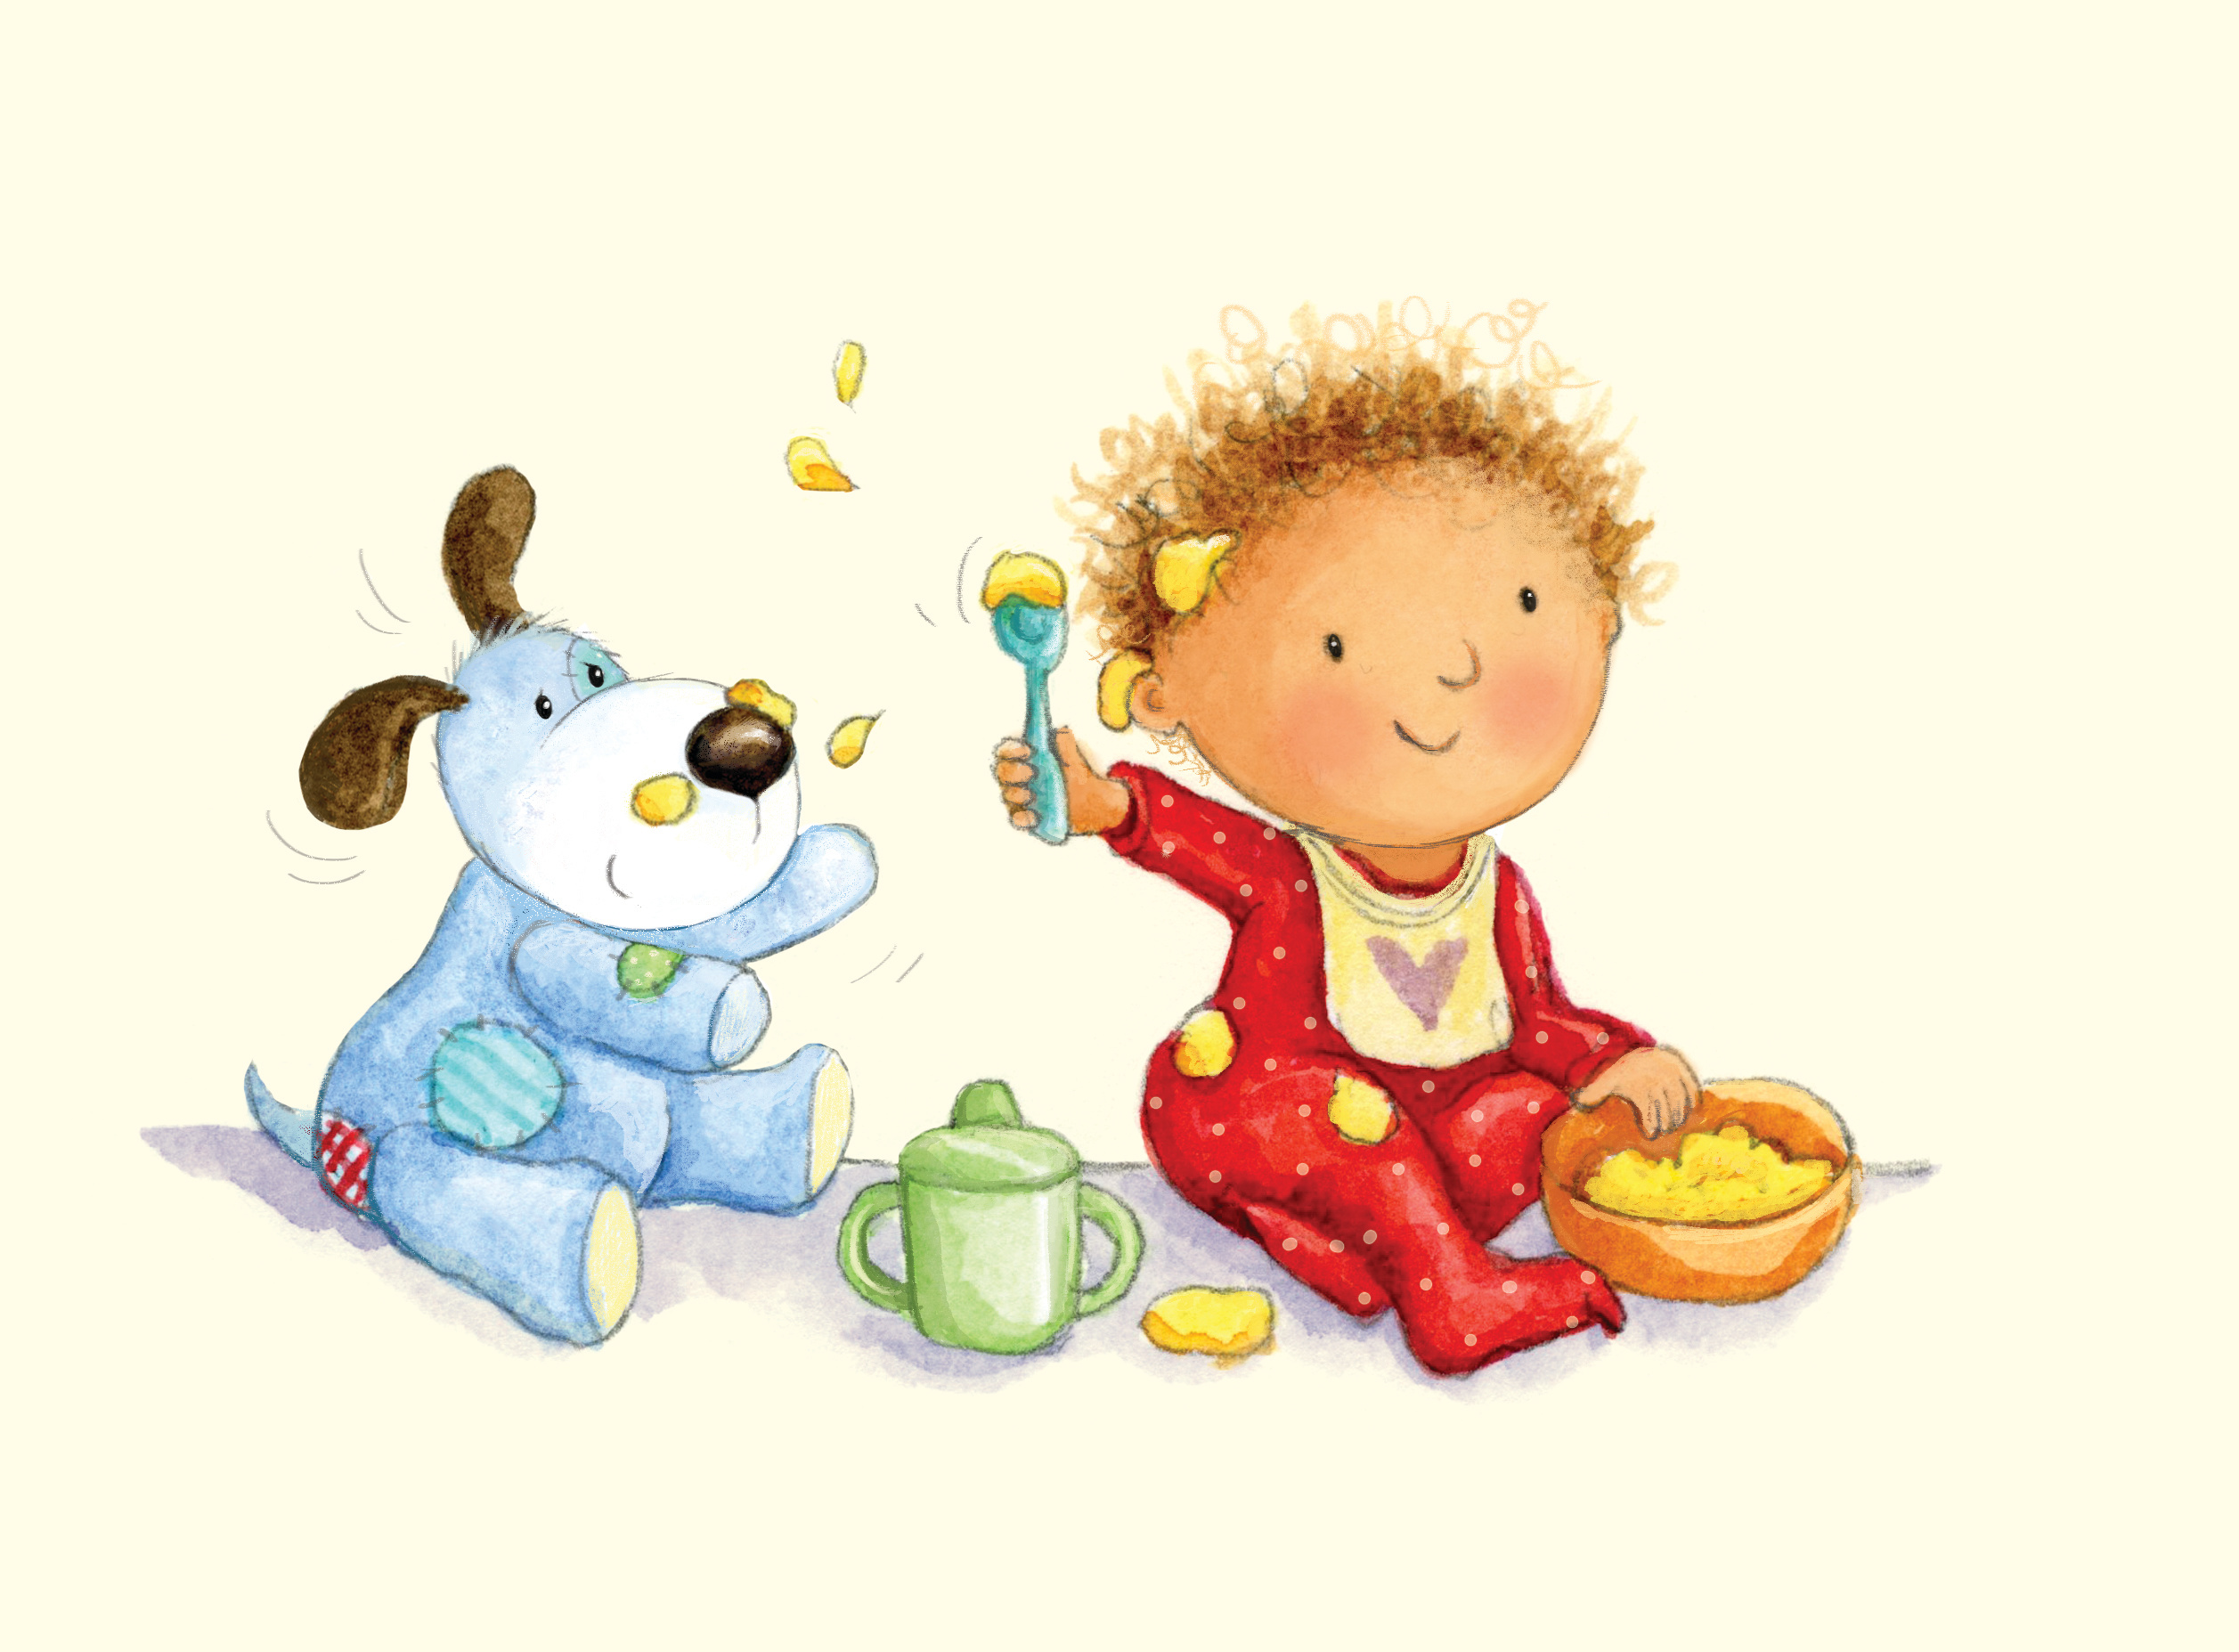 baby eating_illustration_gail yerrill